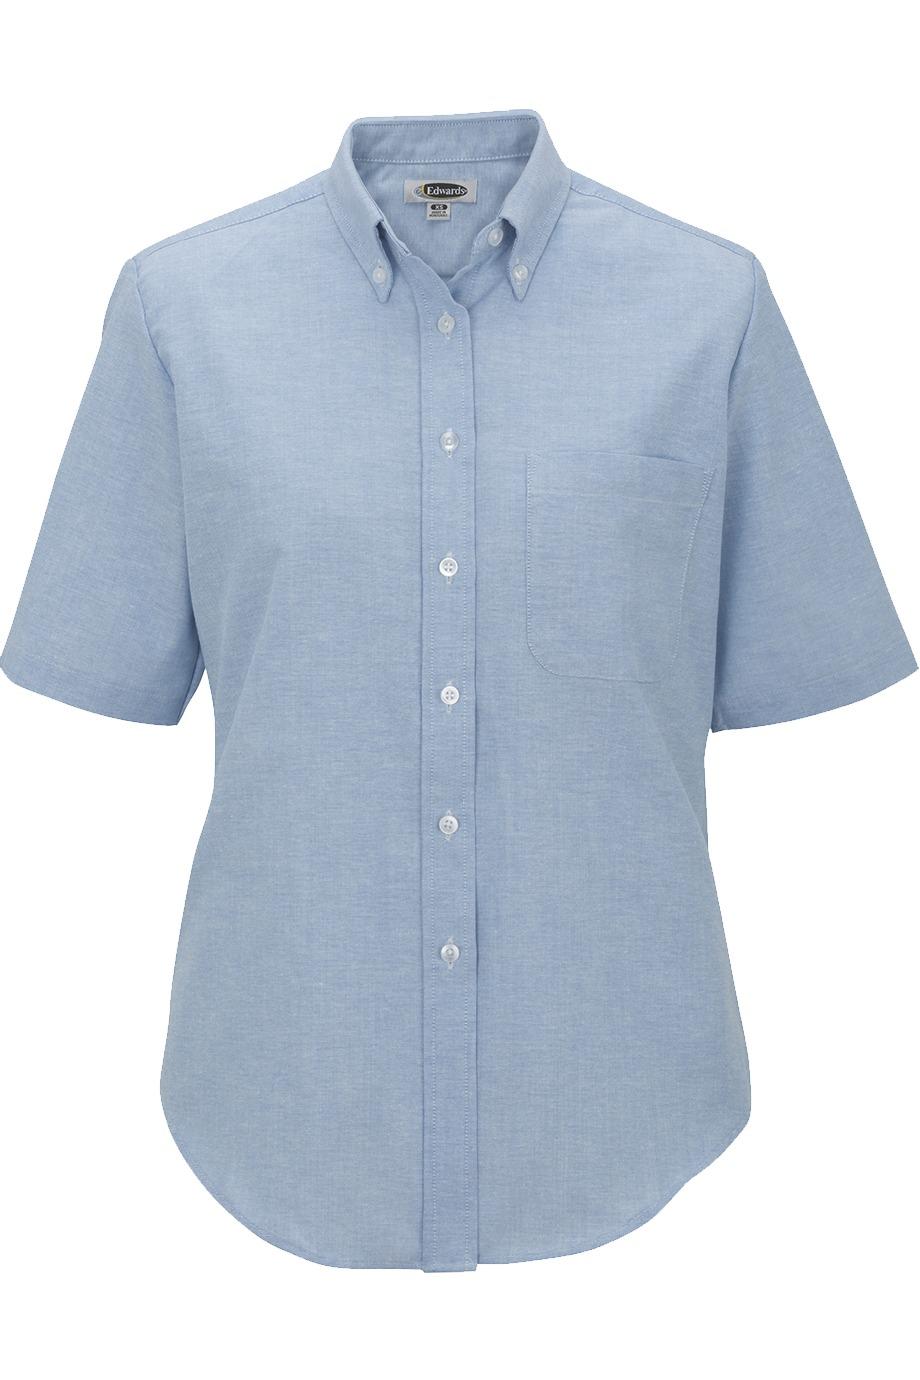 Edwards Garment 5027 女士短袖牛津布衬衣